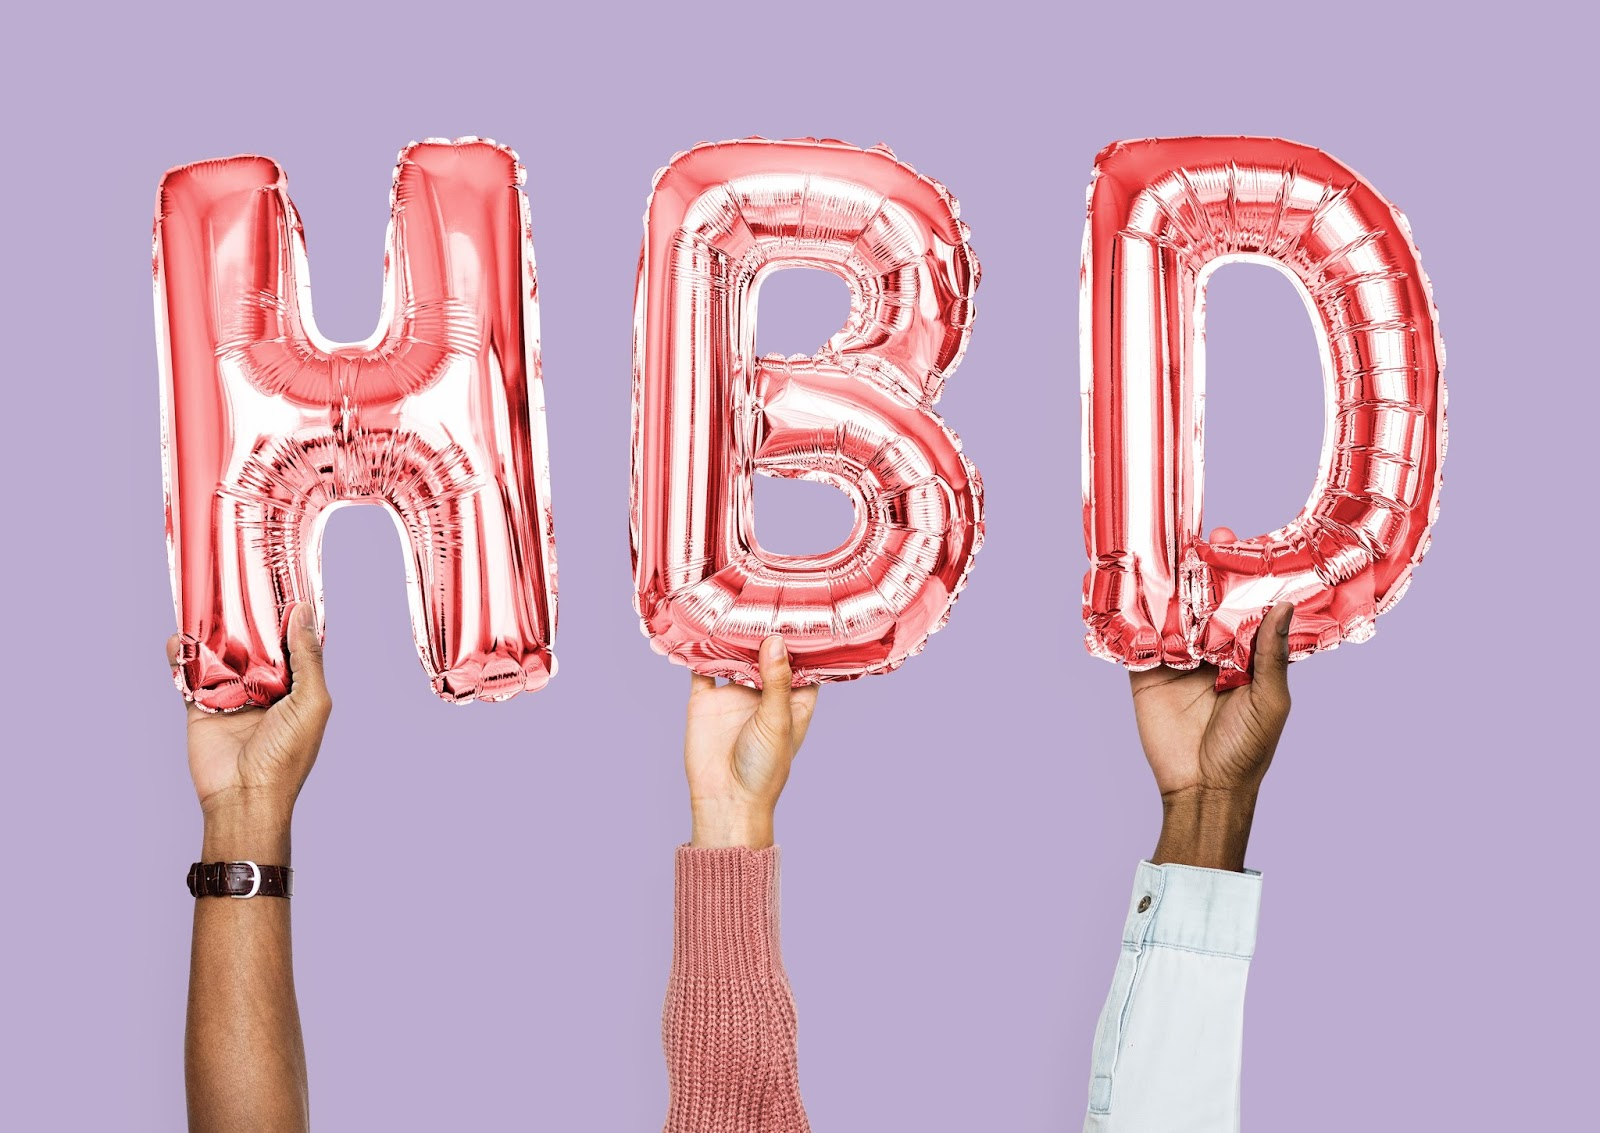 Ucapan Selamat Ulang Tahun Terindah Untuk Teman